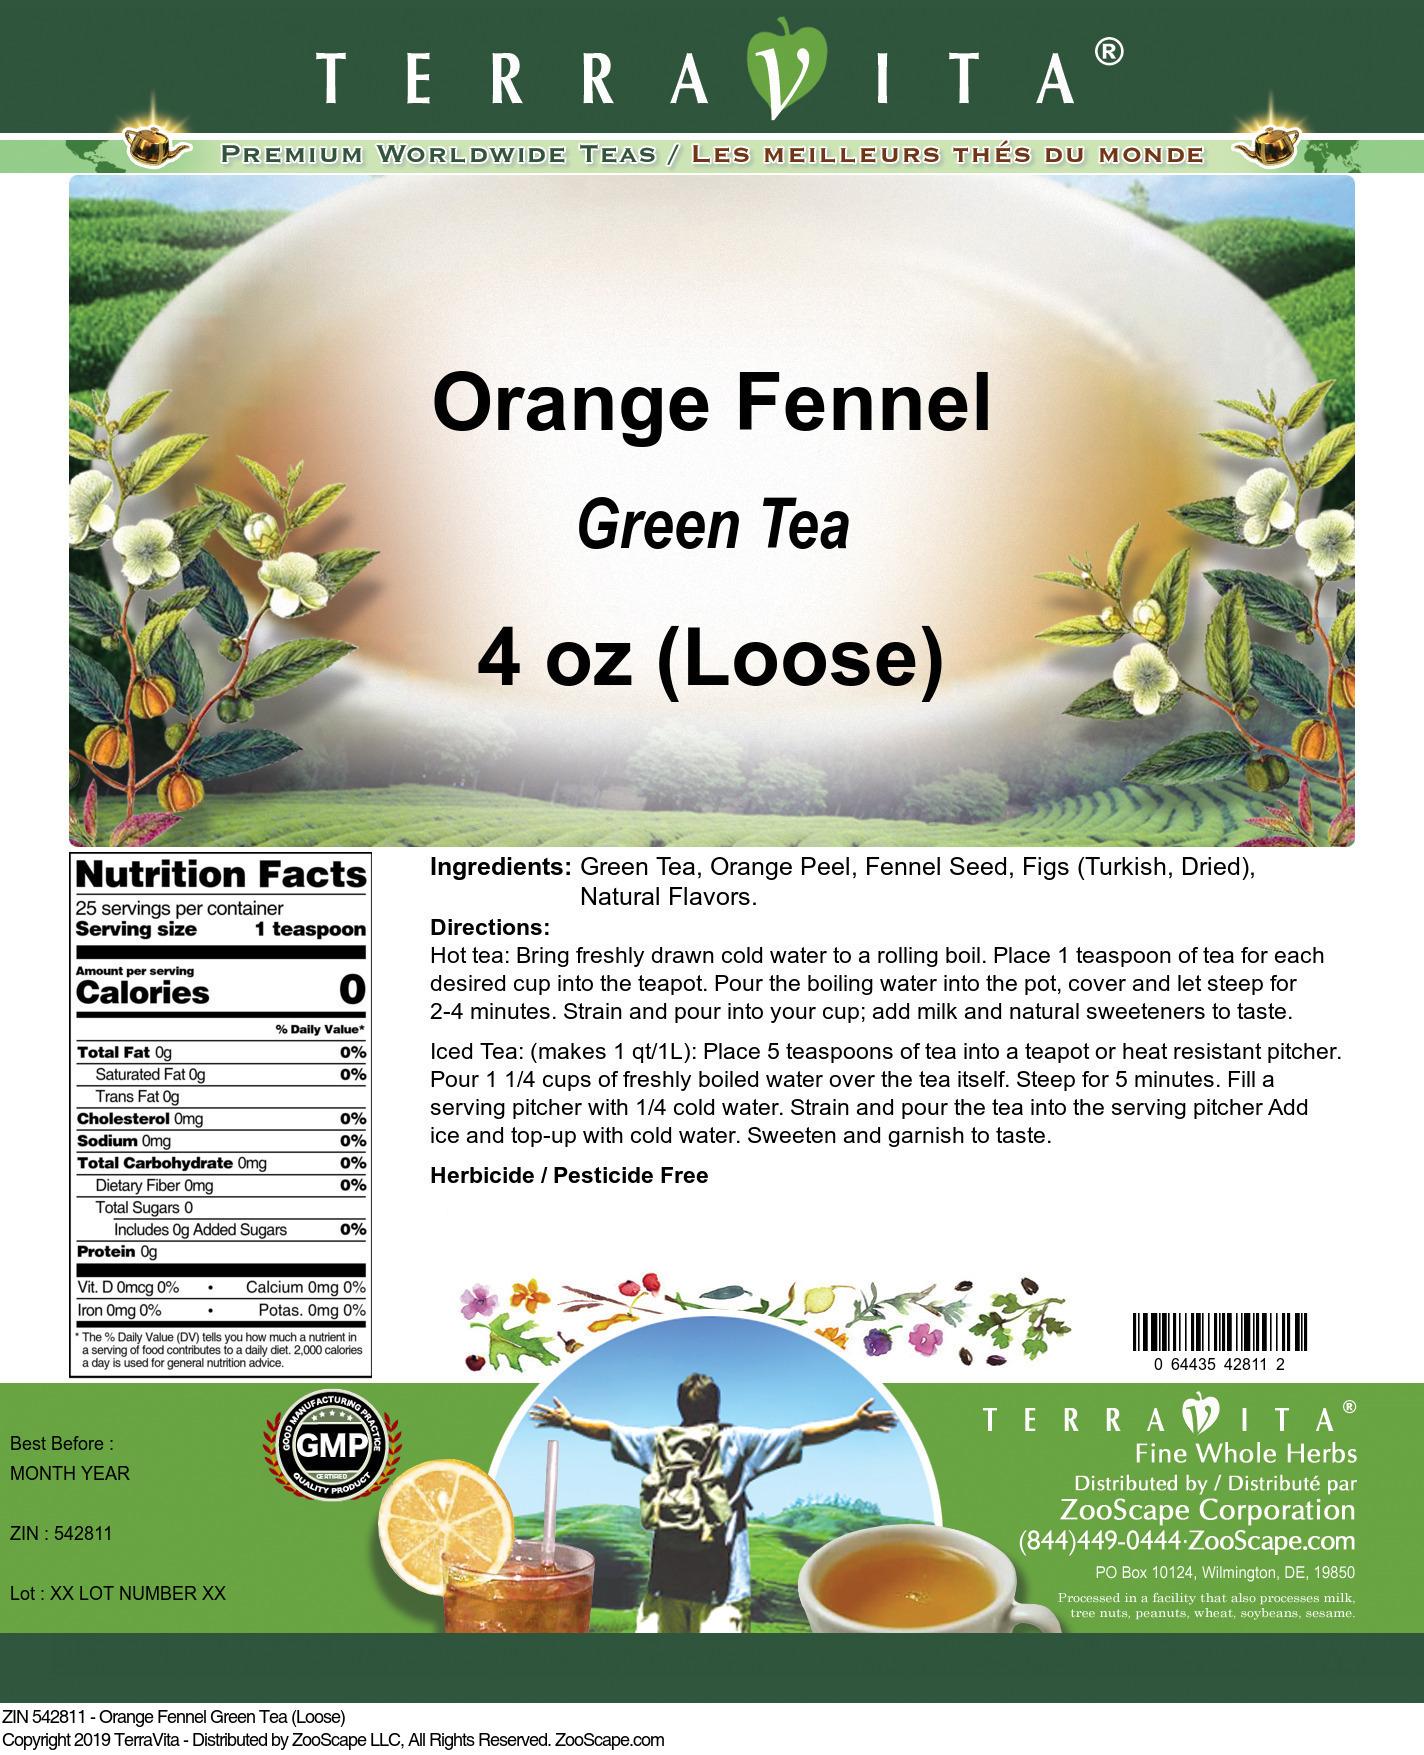 Orange Fennel Green Tea (Loose)